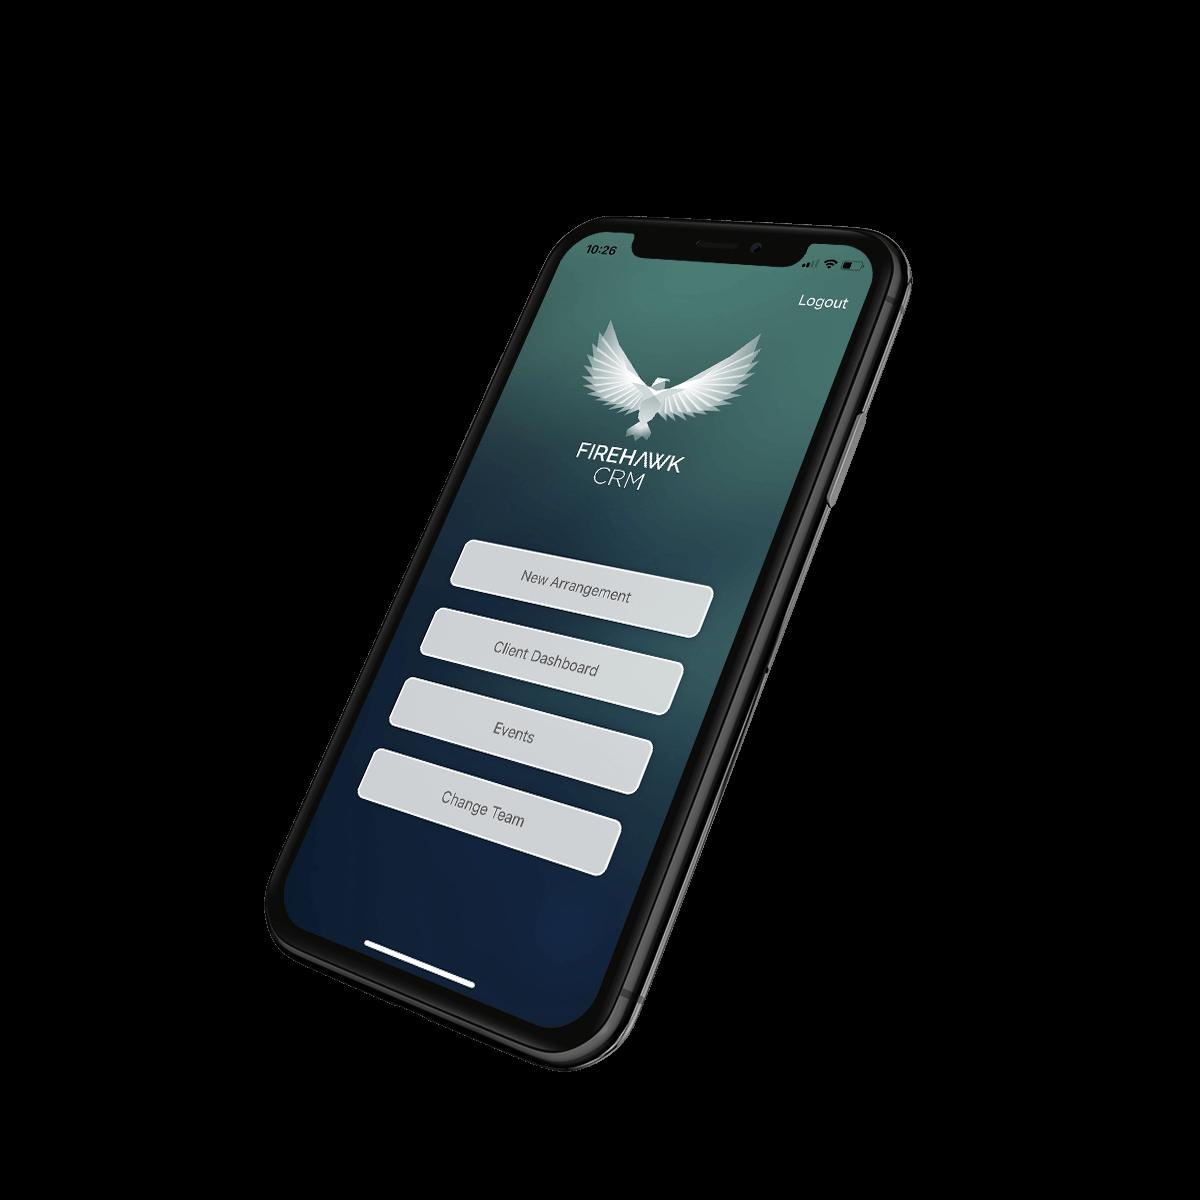 iphone arrangemnts app